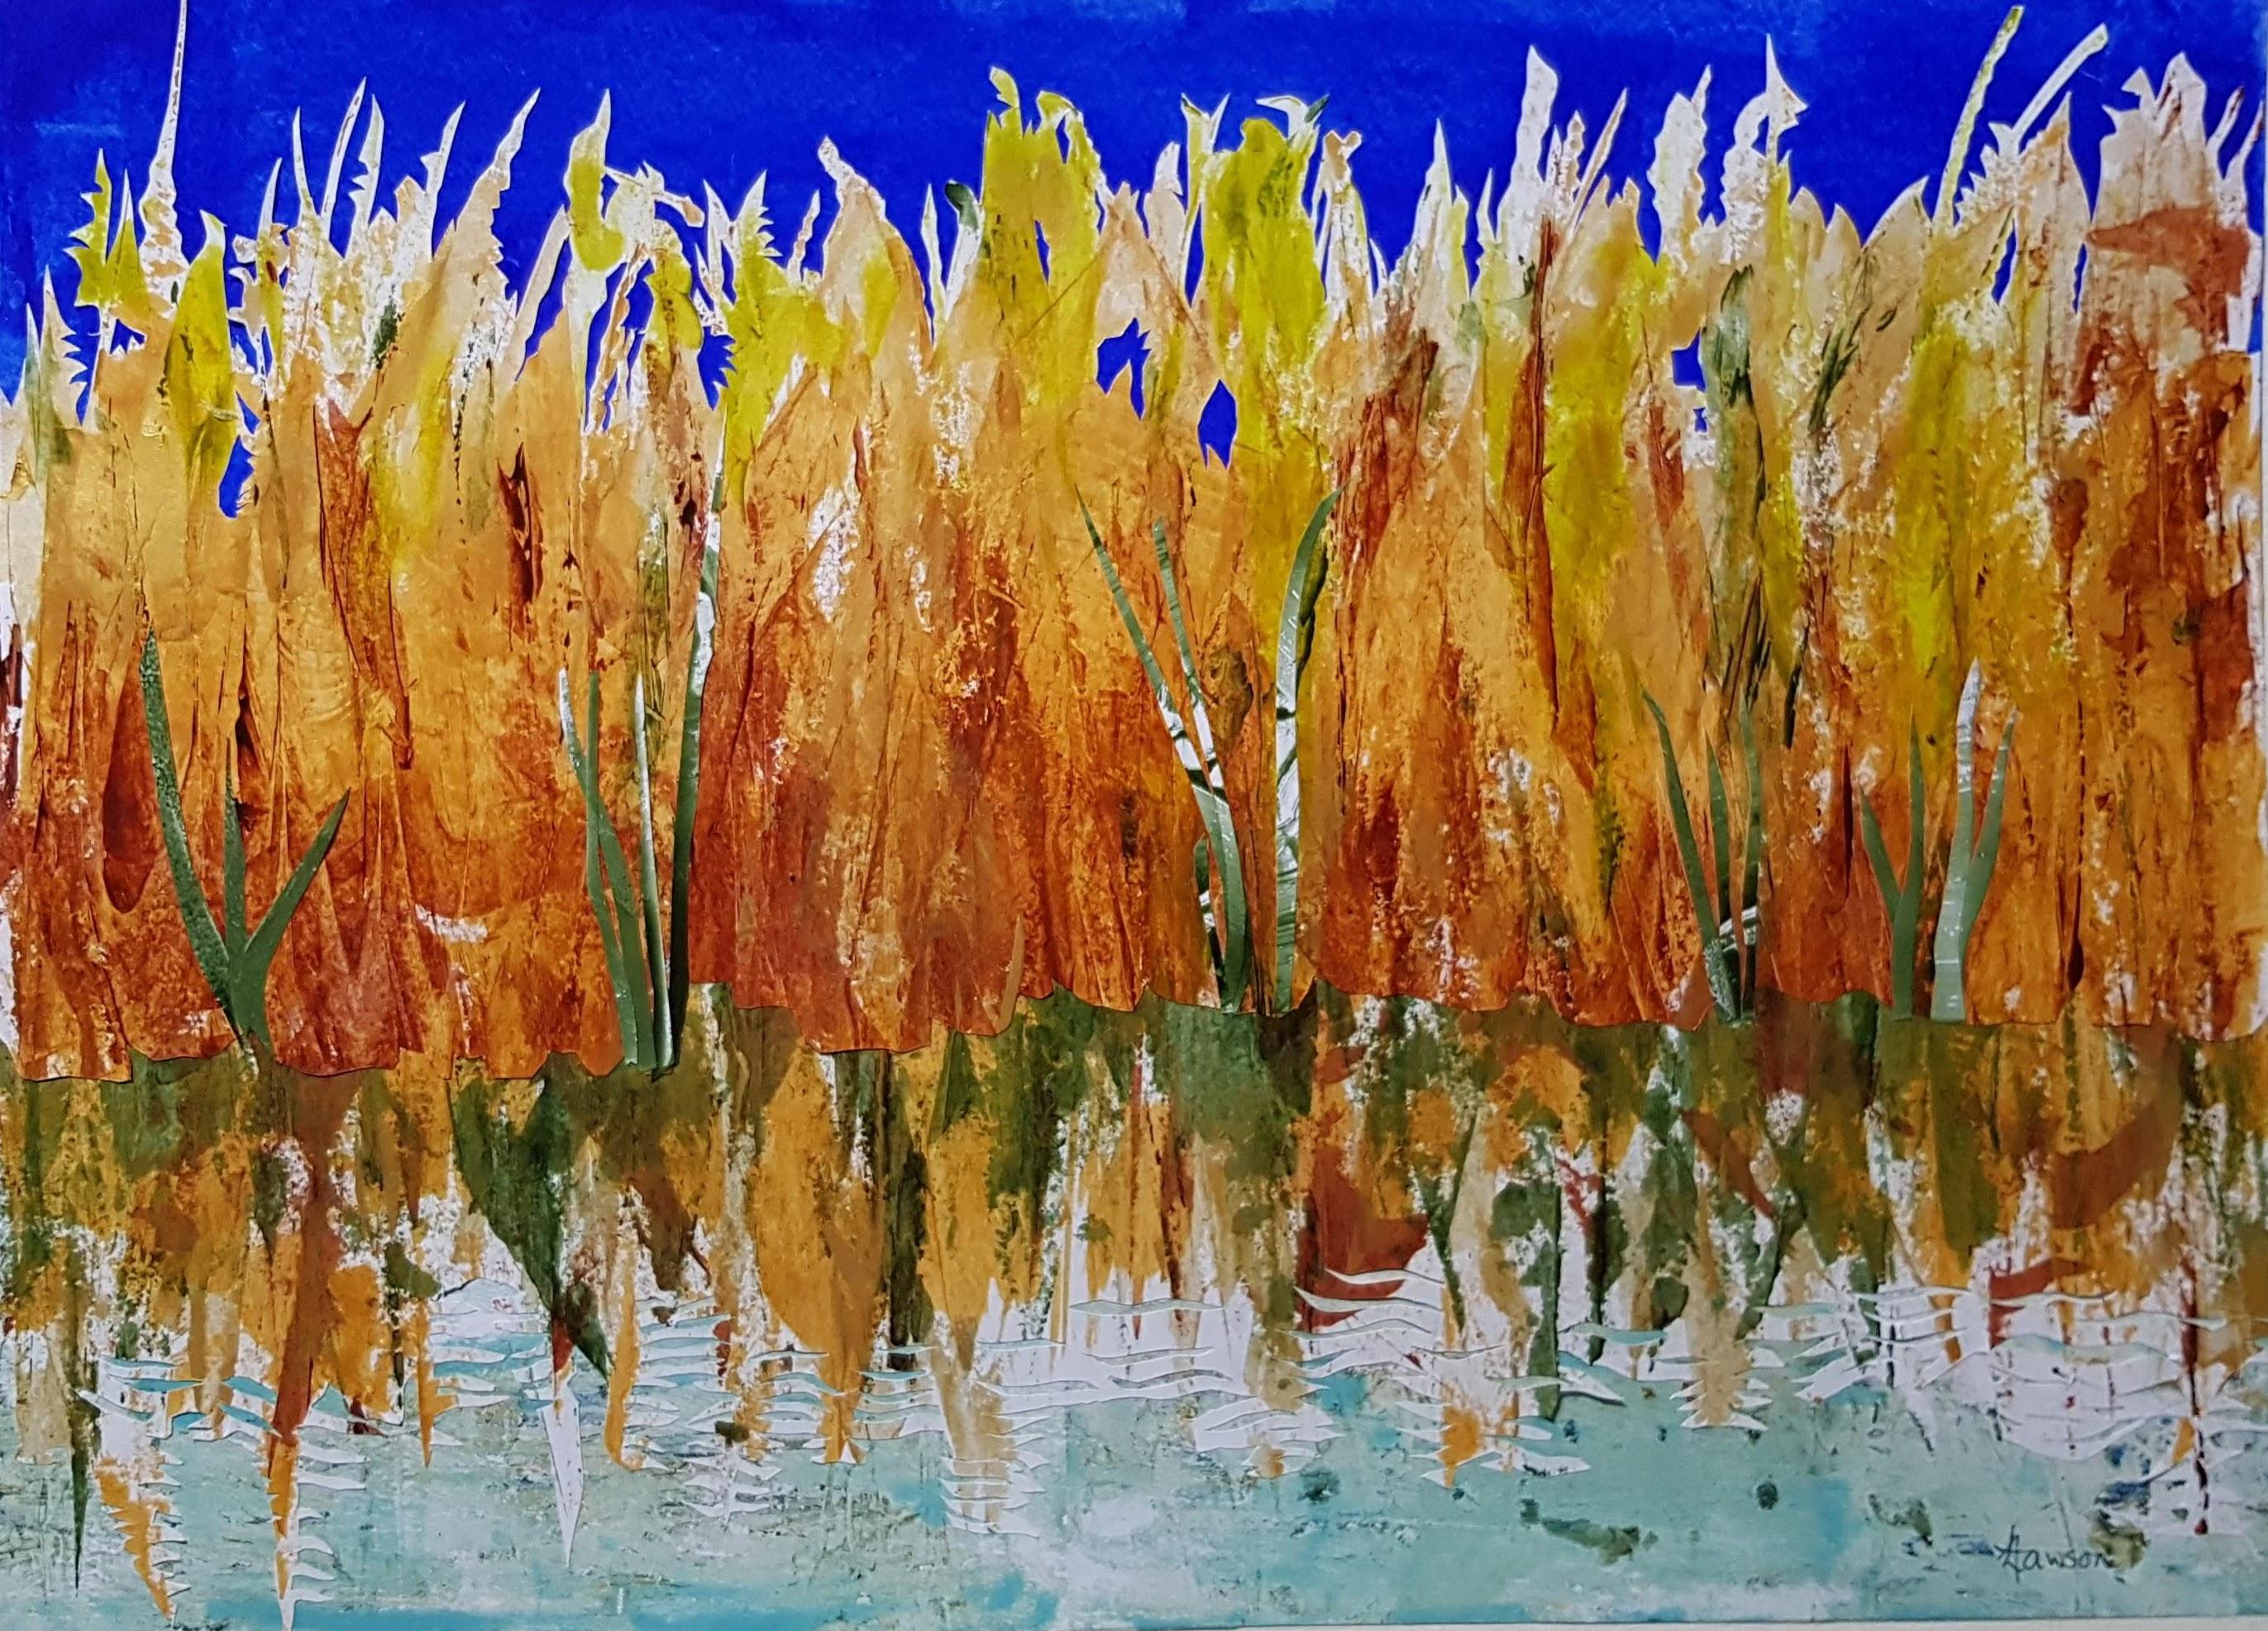 Reeds #1 Image copyright Anne Lawson 2021